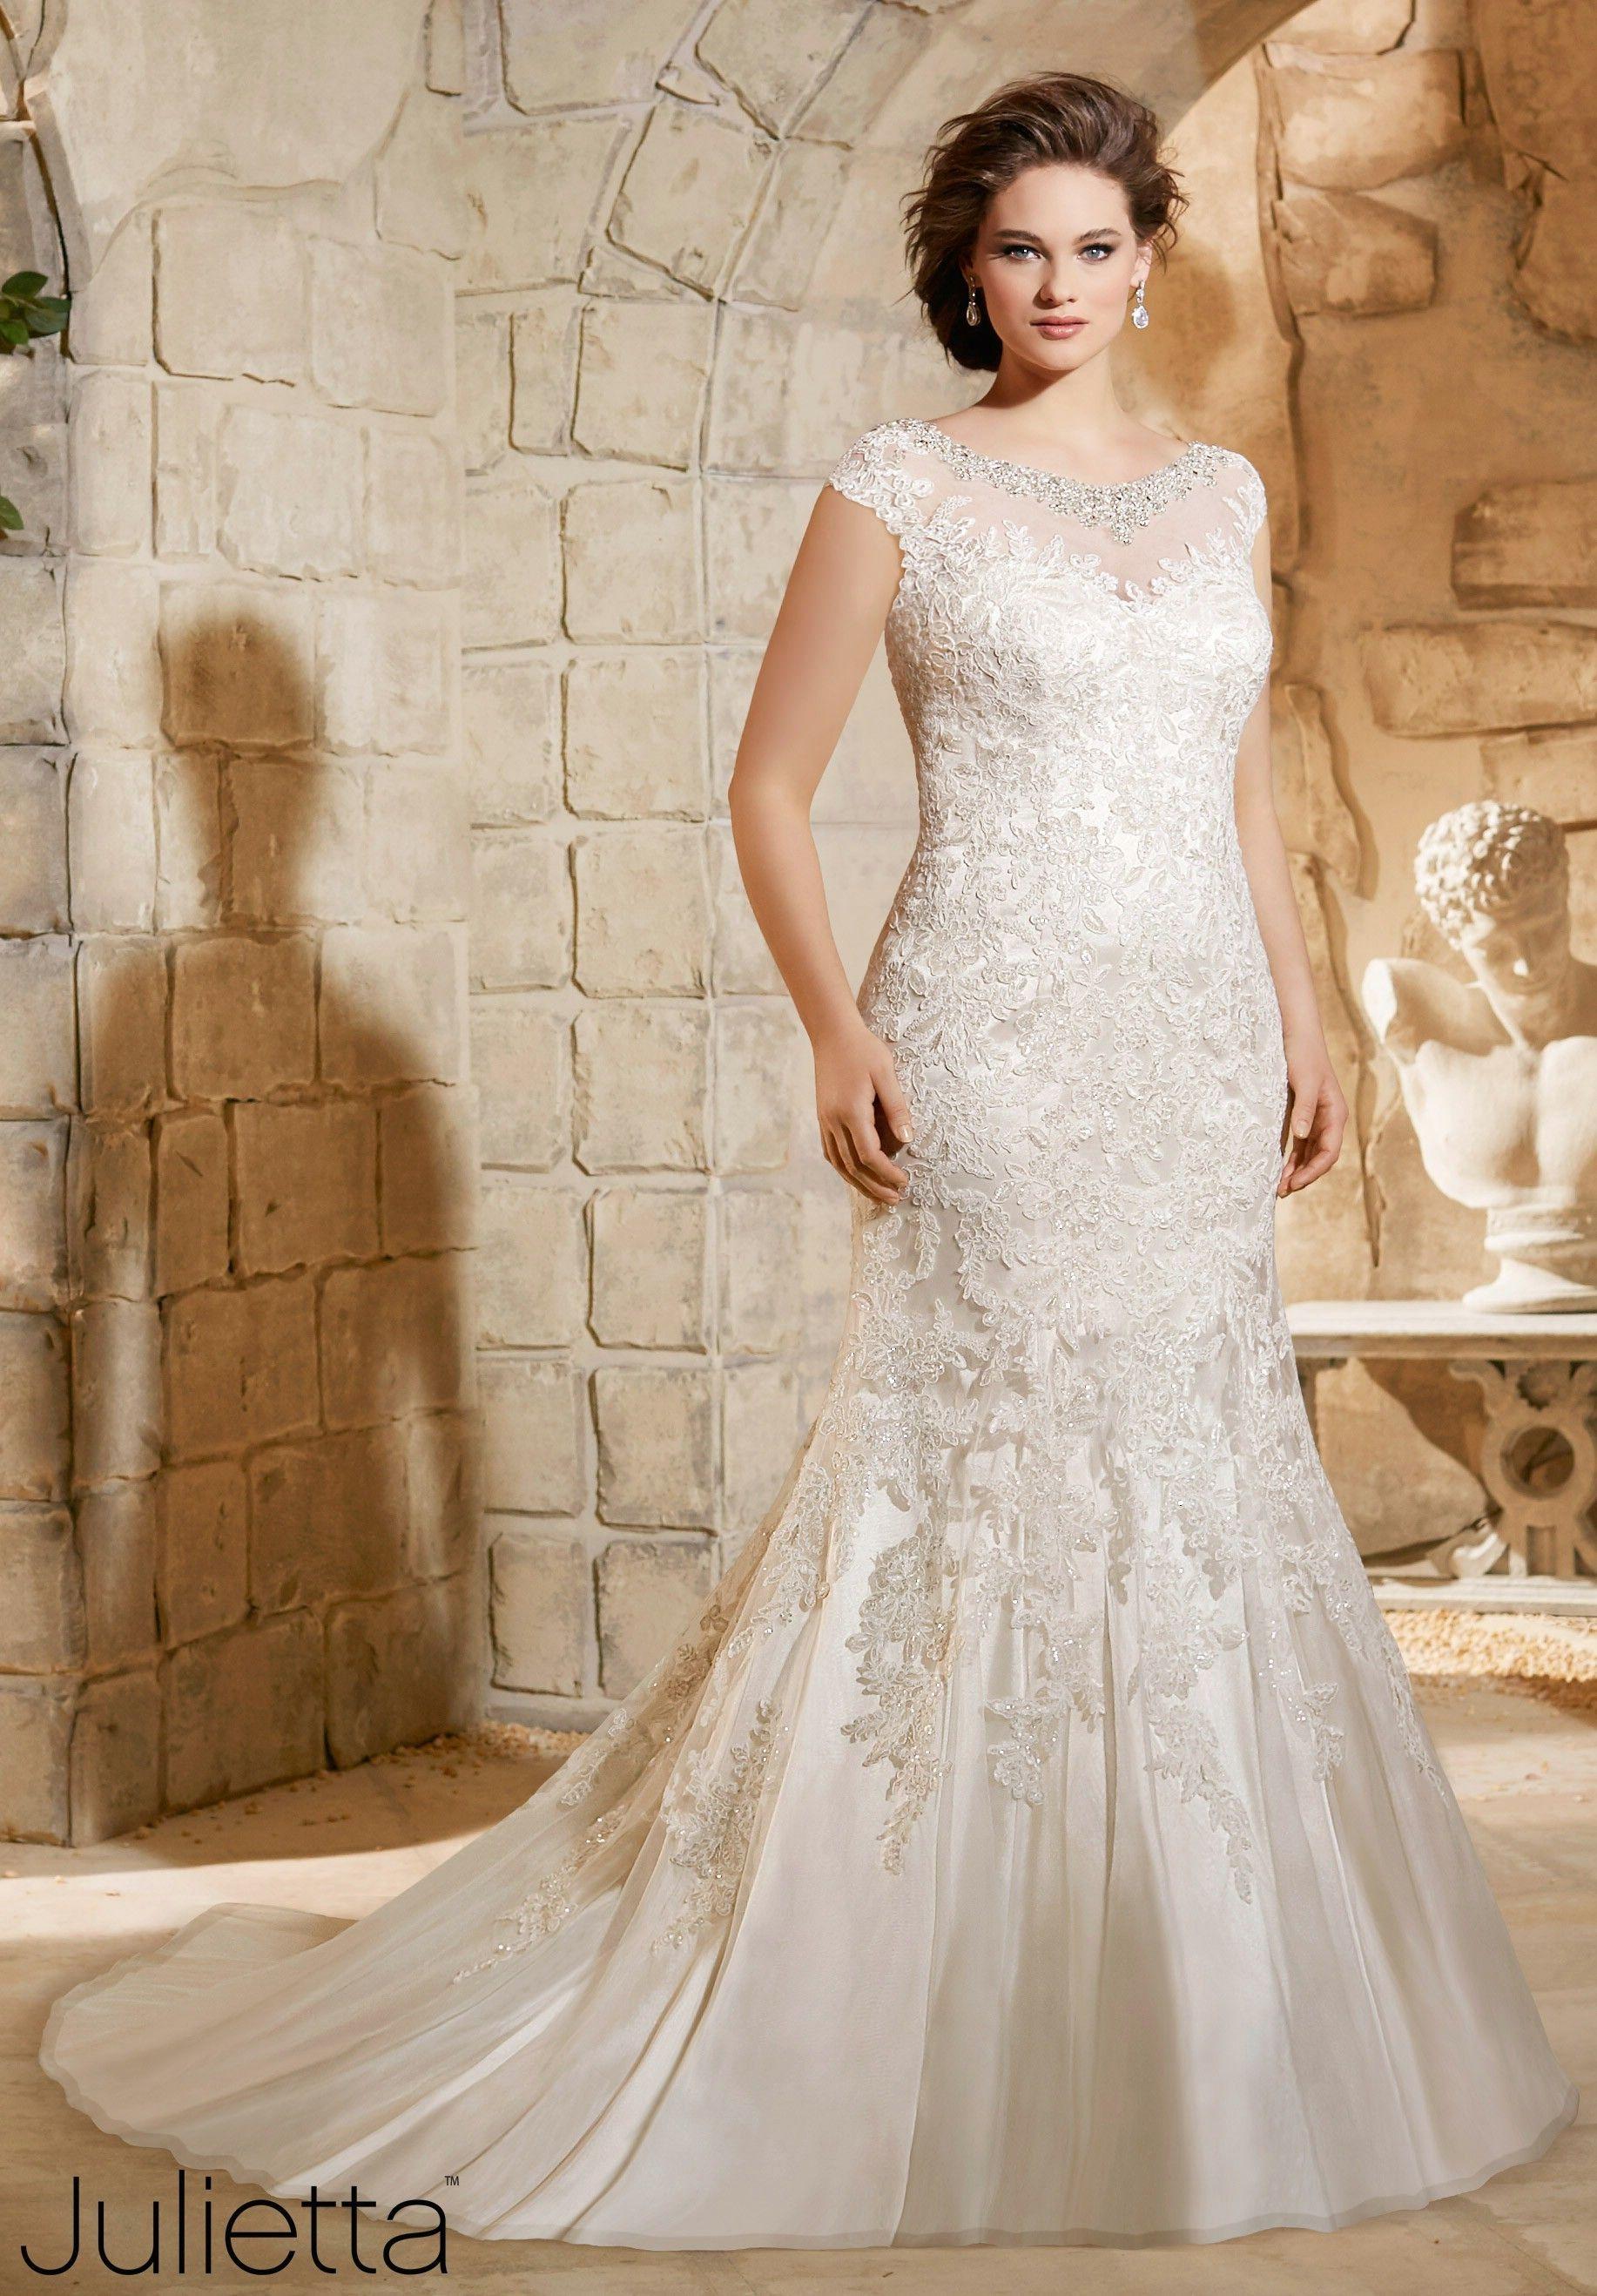 Mori Lee Julietta Wedding Dresses - Style 3188 [3188] - $1,300.00 ...